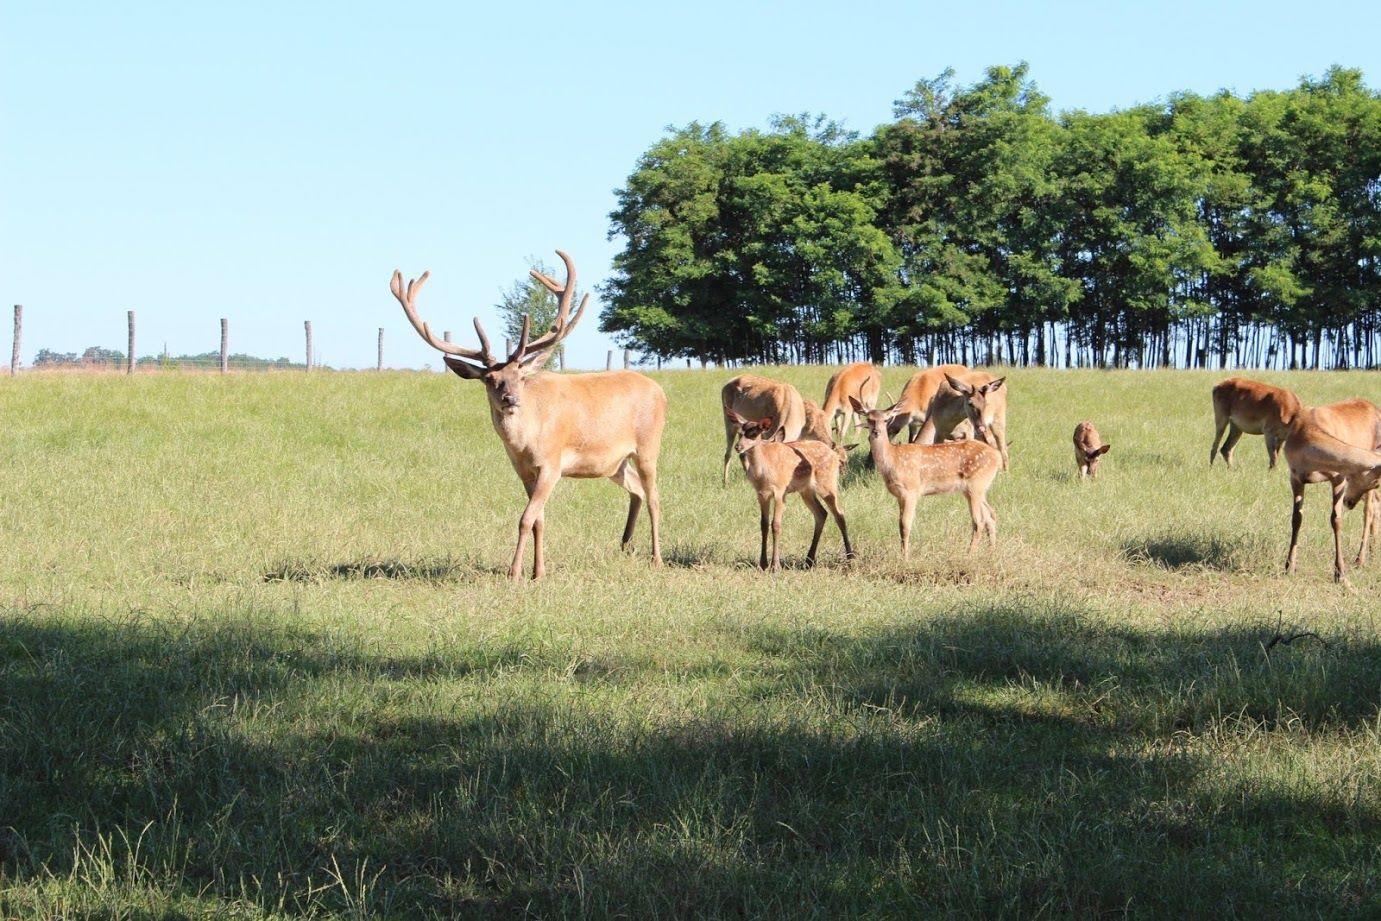 deer farm, animals, nature